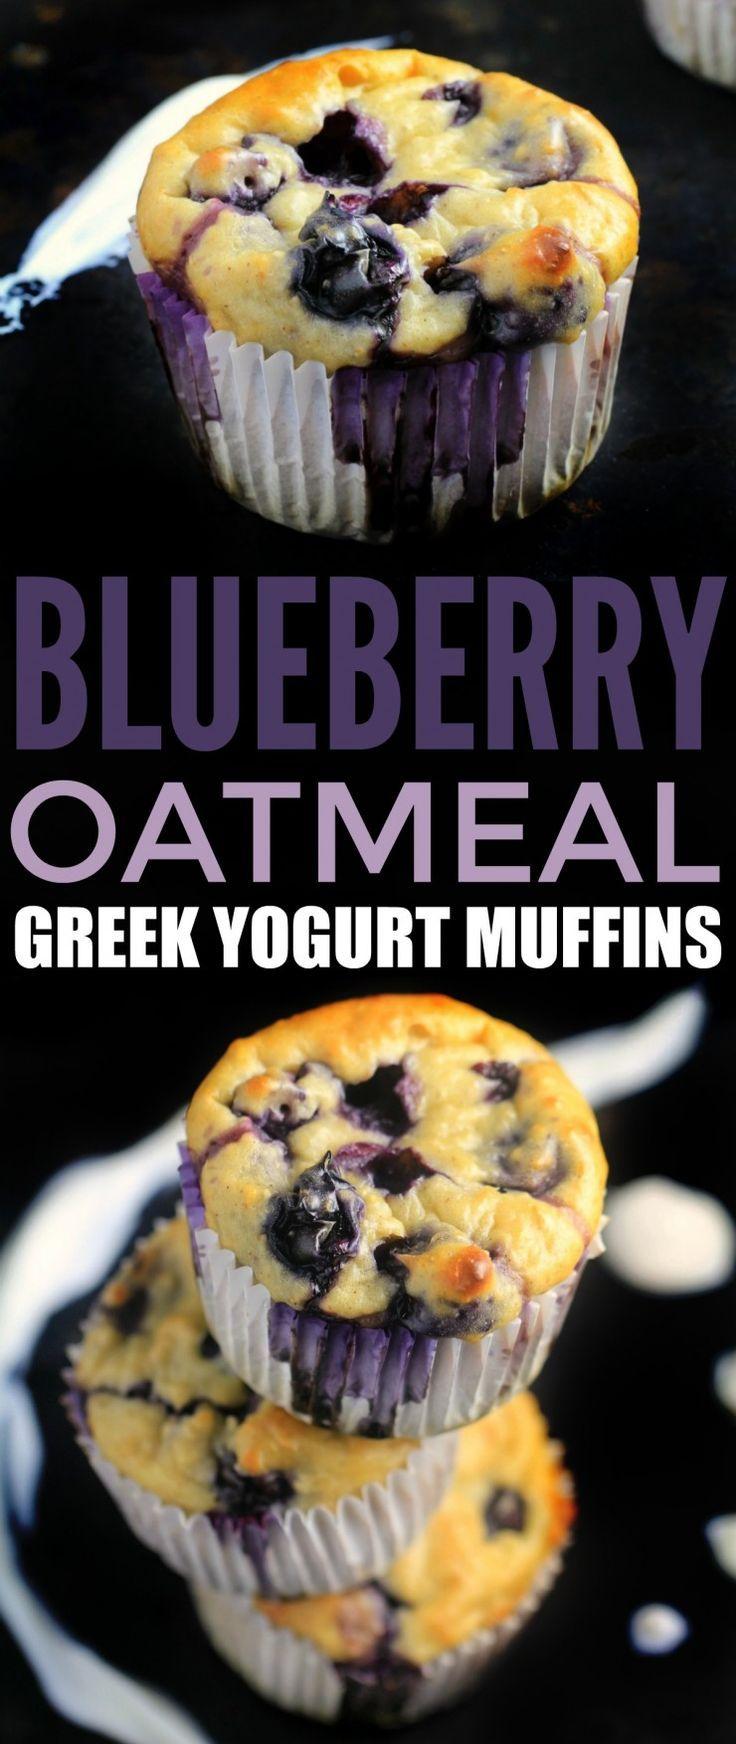 Blueberry Oatmeal Greek Yogurt Muffins | Recipe ...